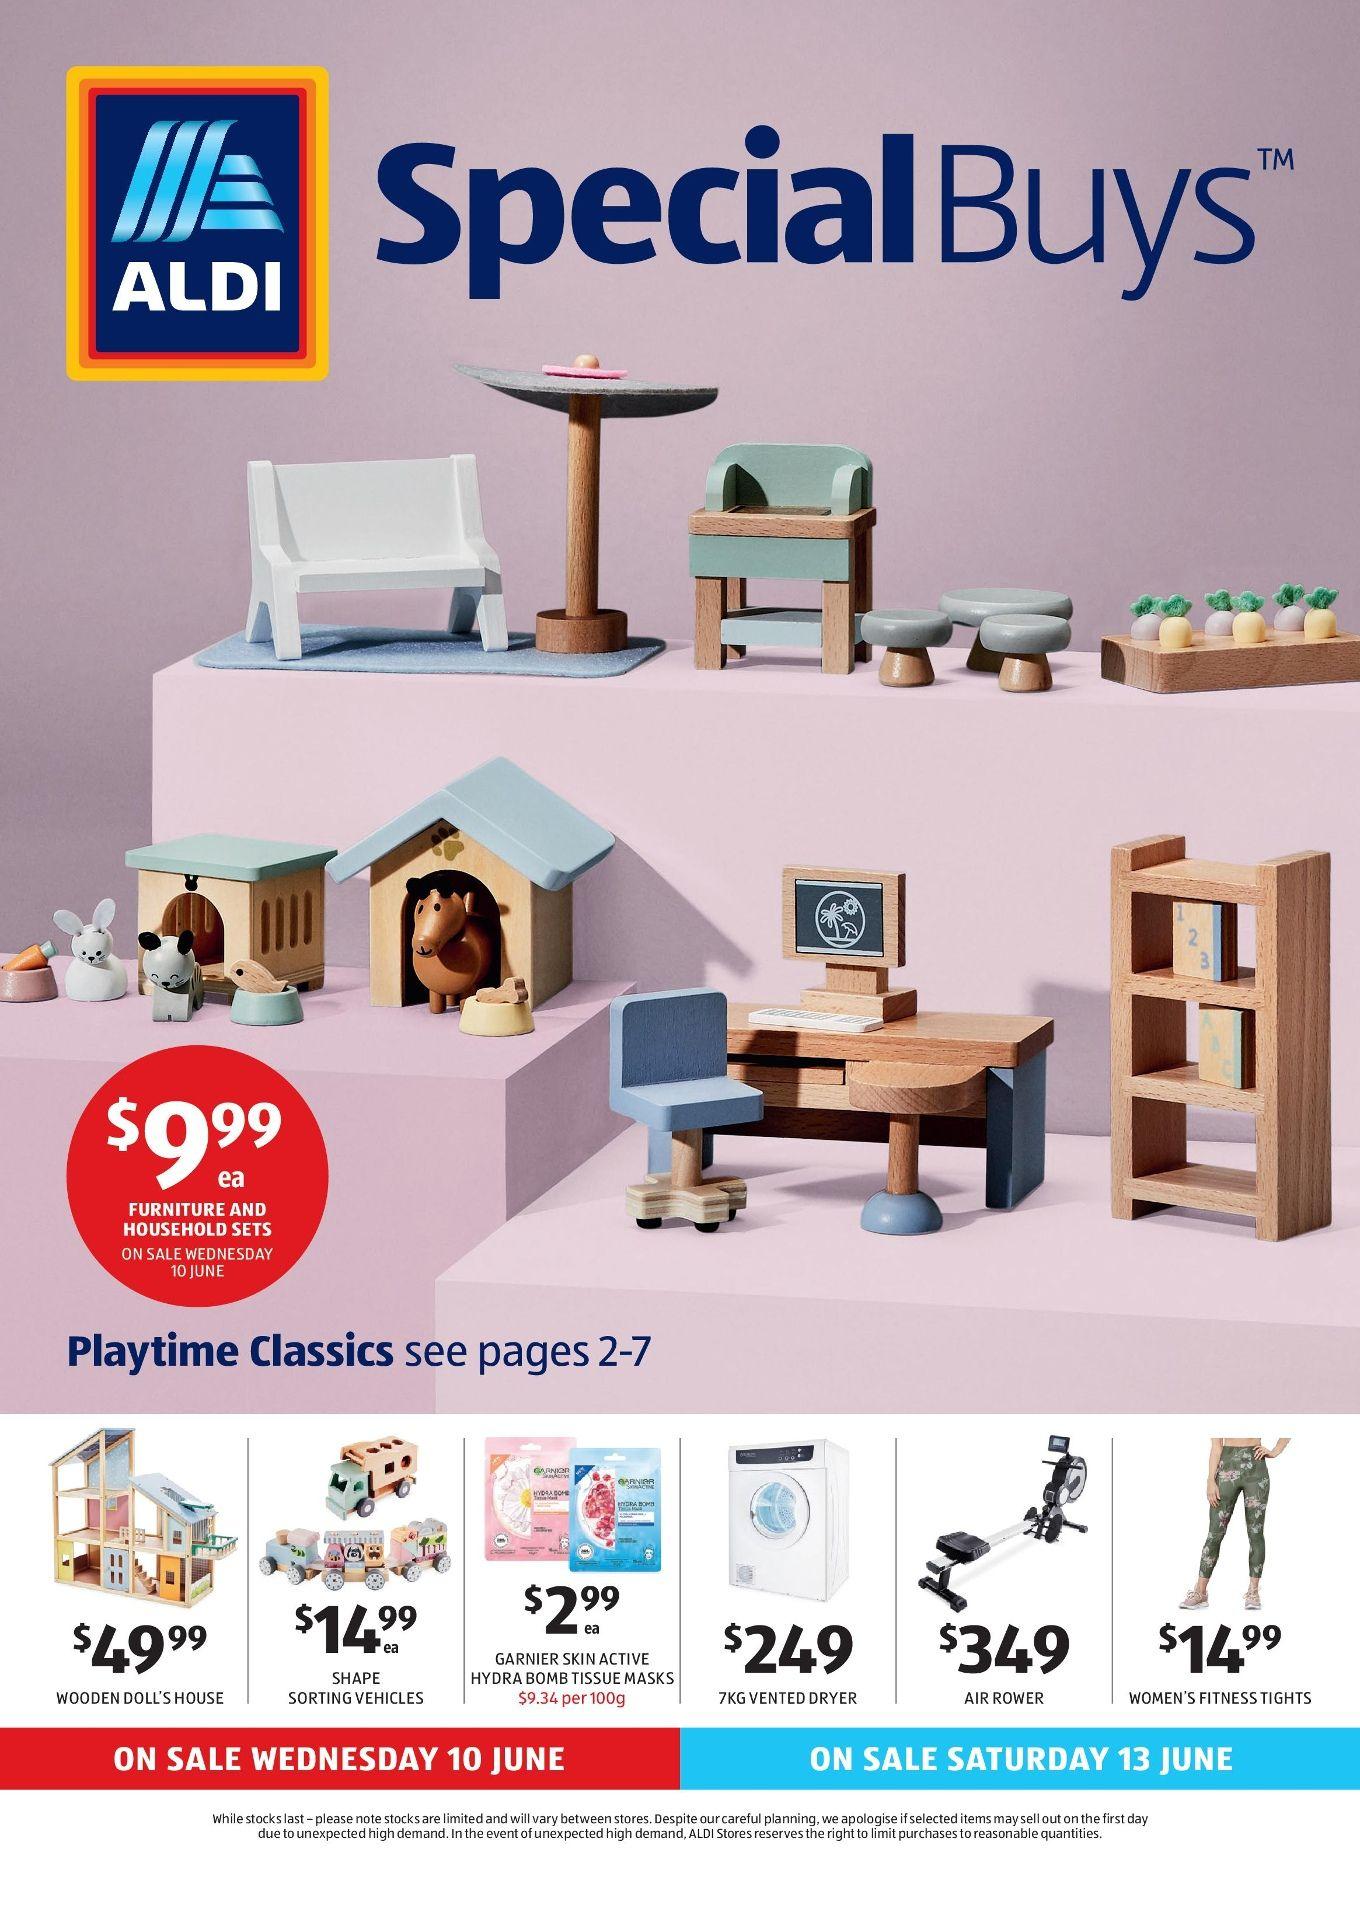 Aldi Catalogue Specials Week 24, 10 June 16 June 2020 in